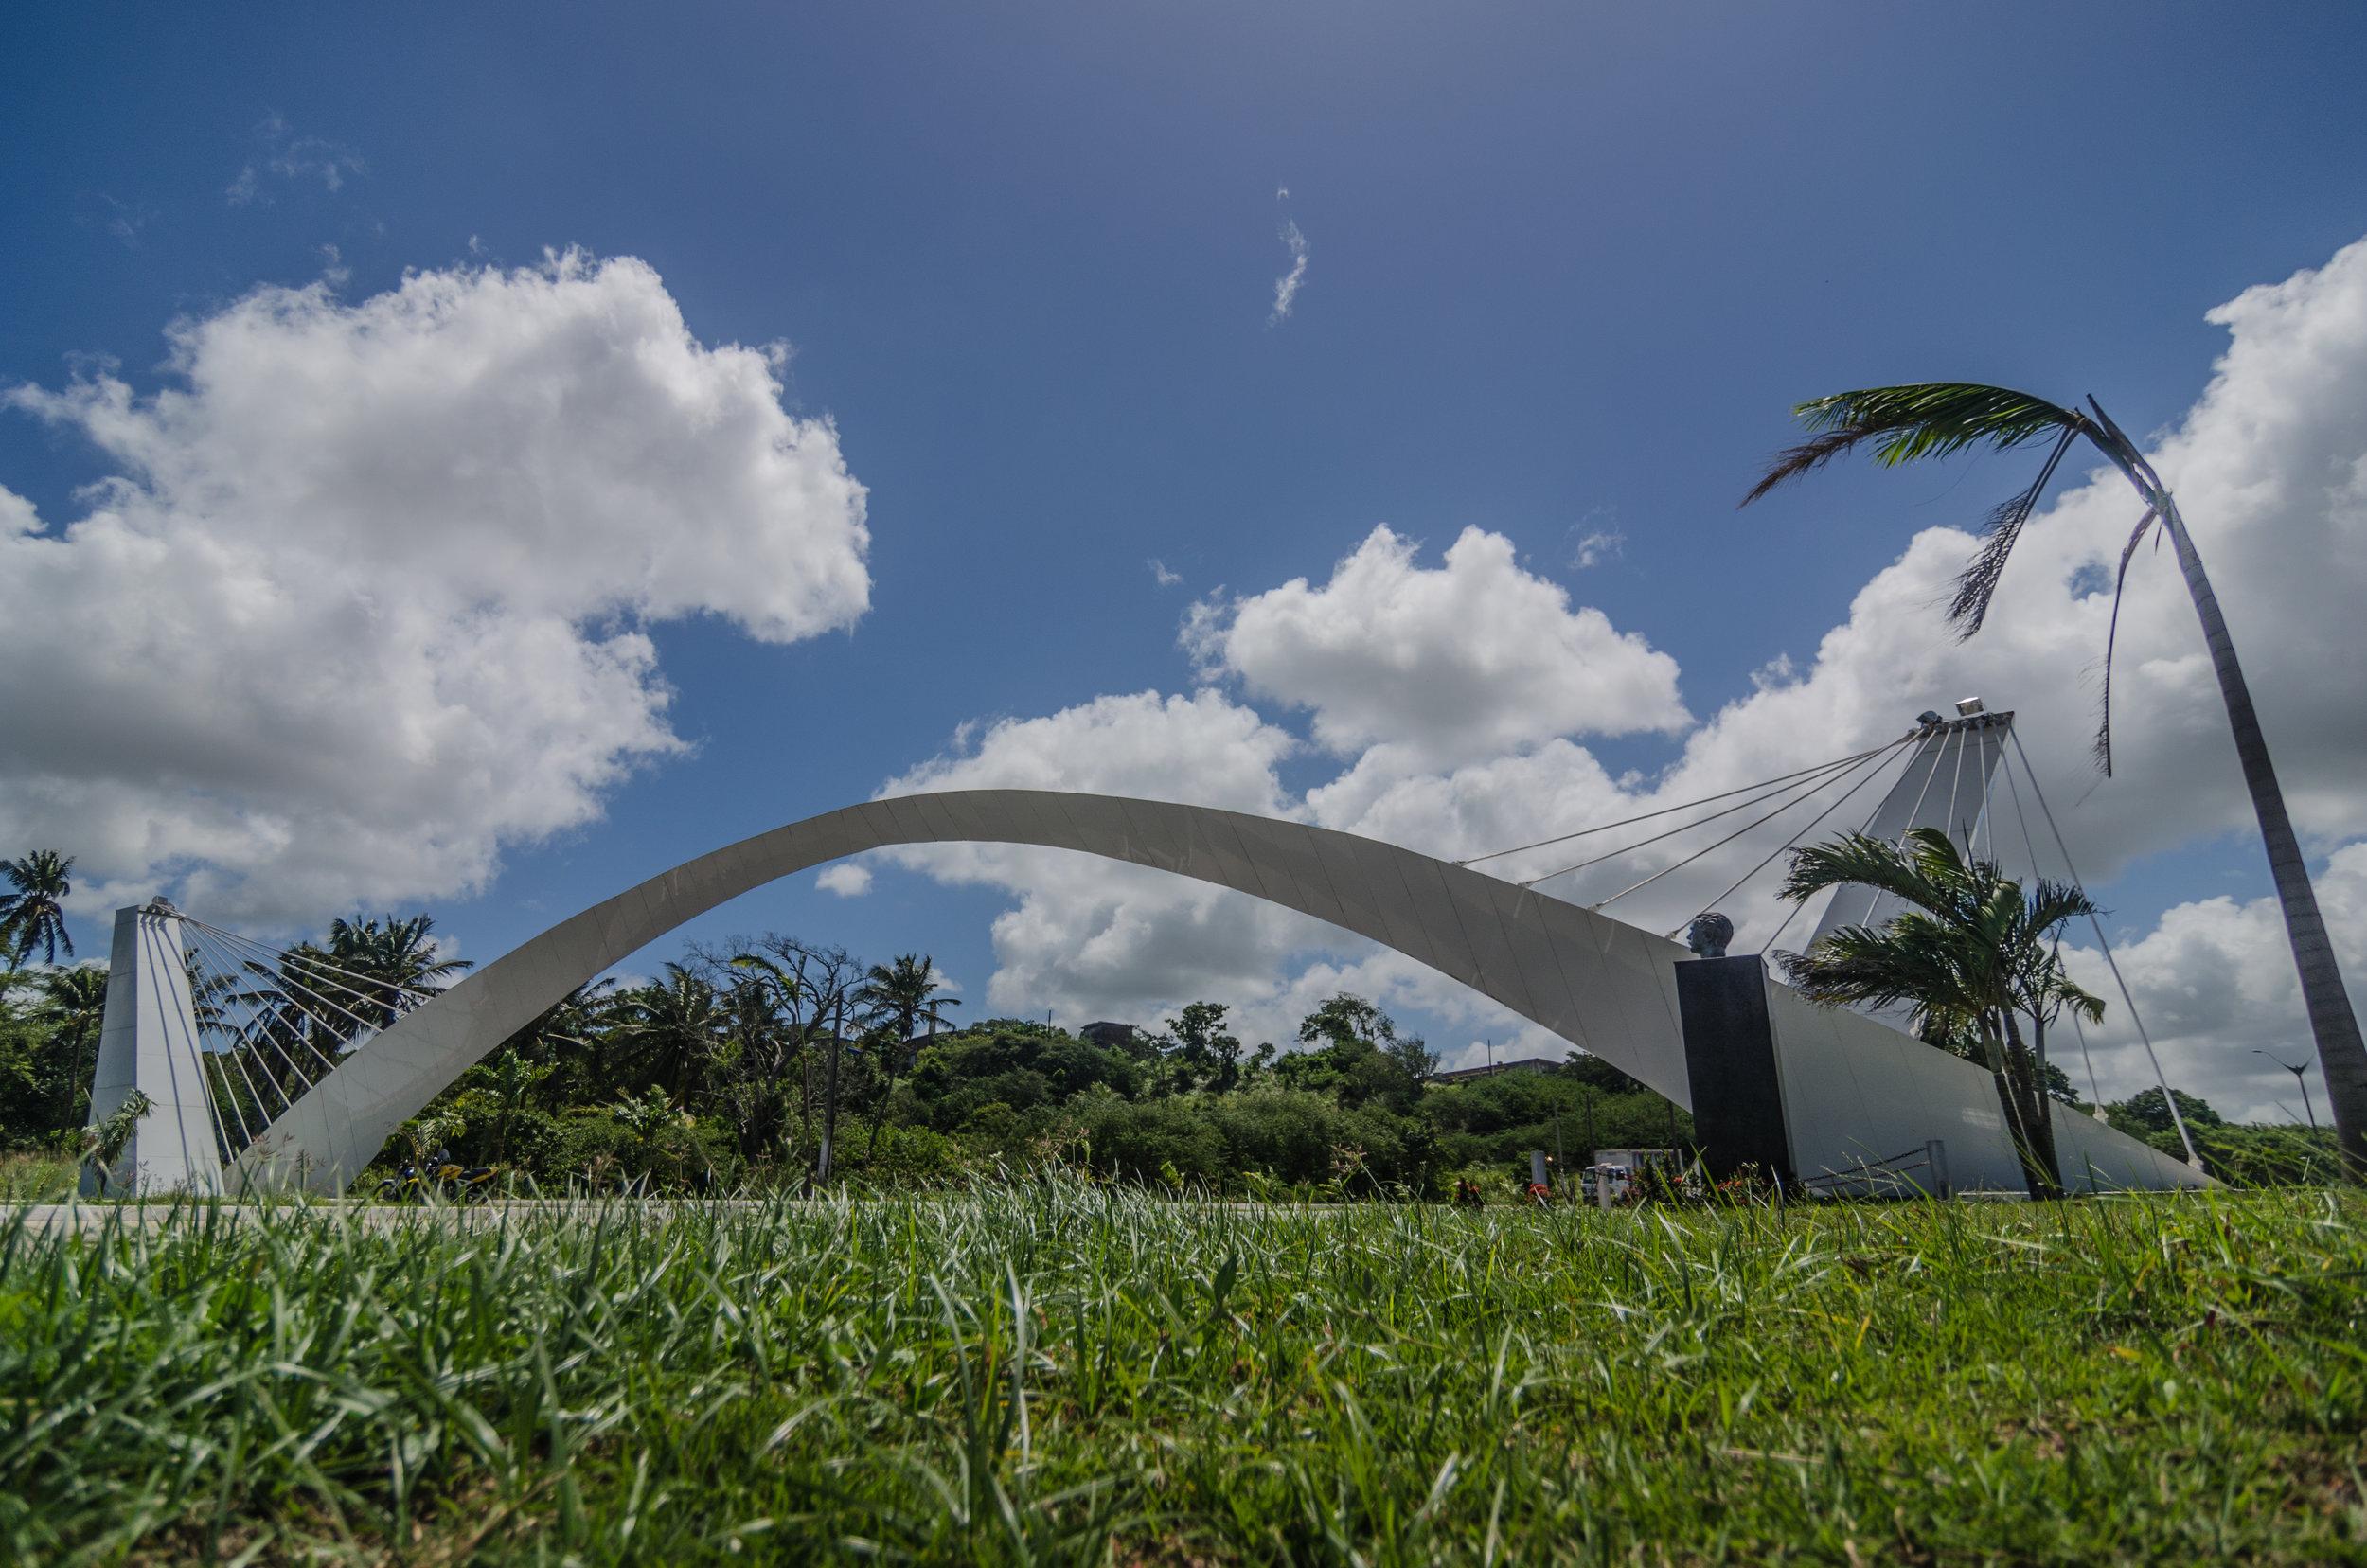 projeto-arquitetonico-portmacaiba-duo-arquitetura-urbanistico-04.jpg